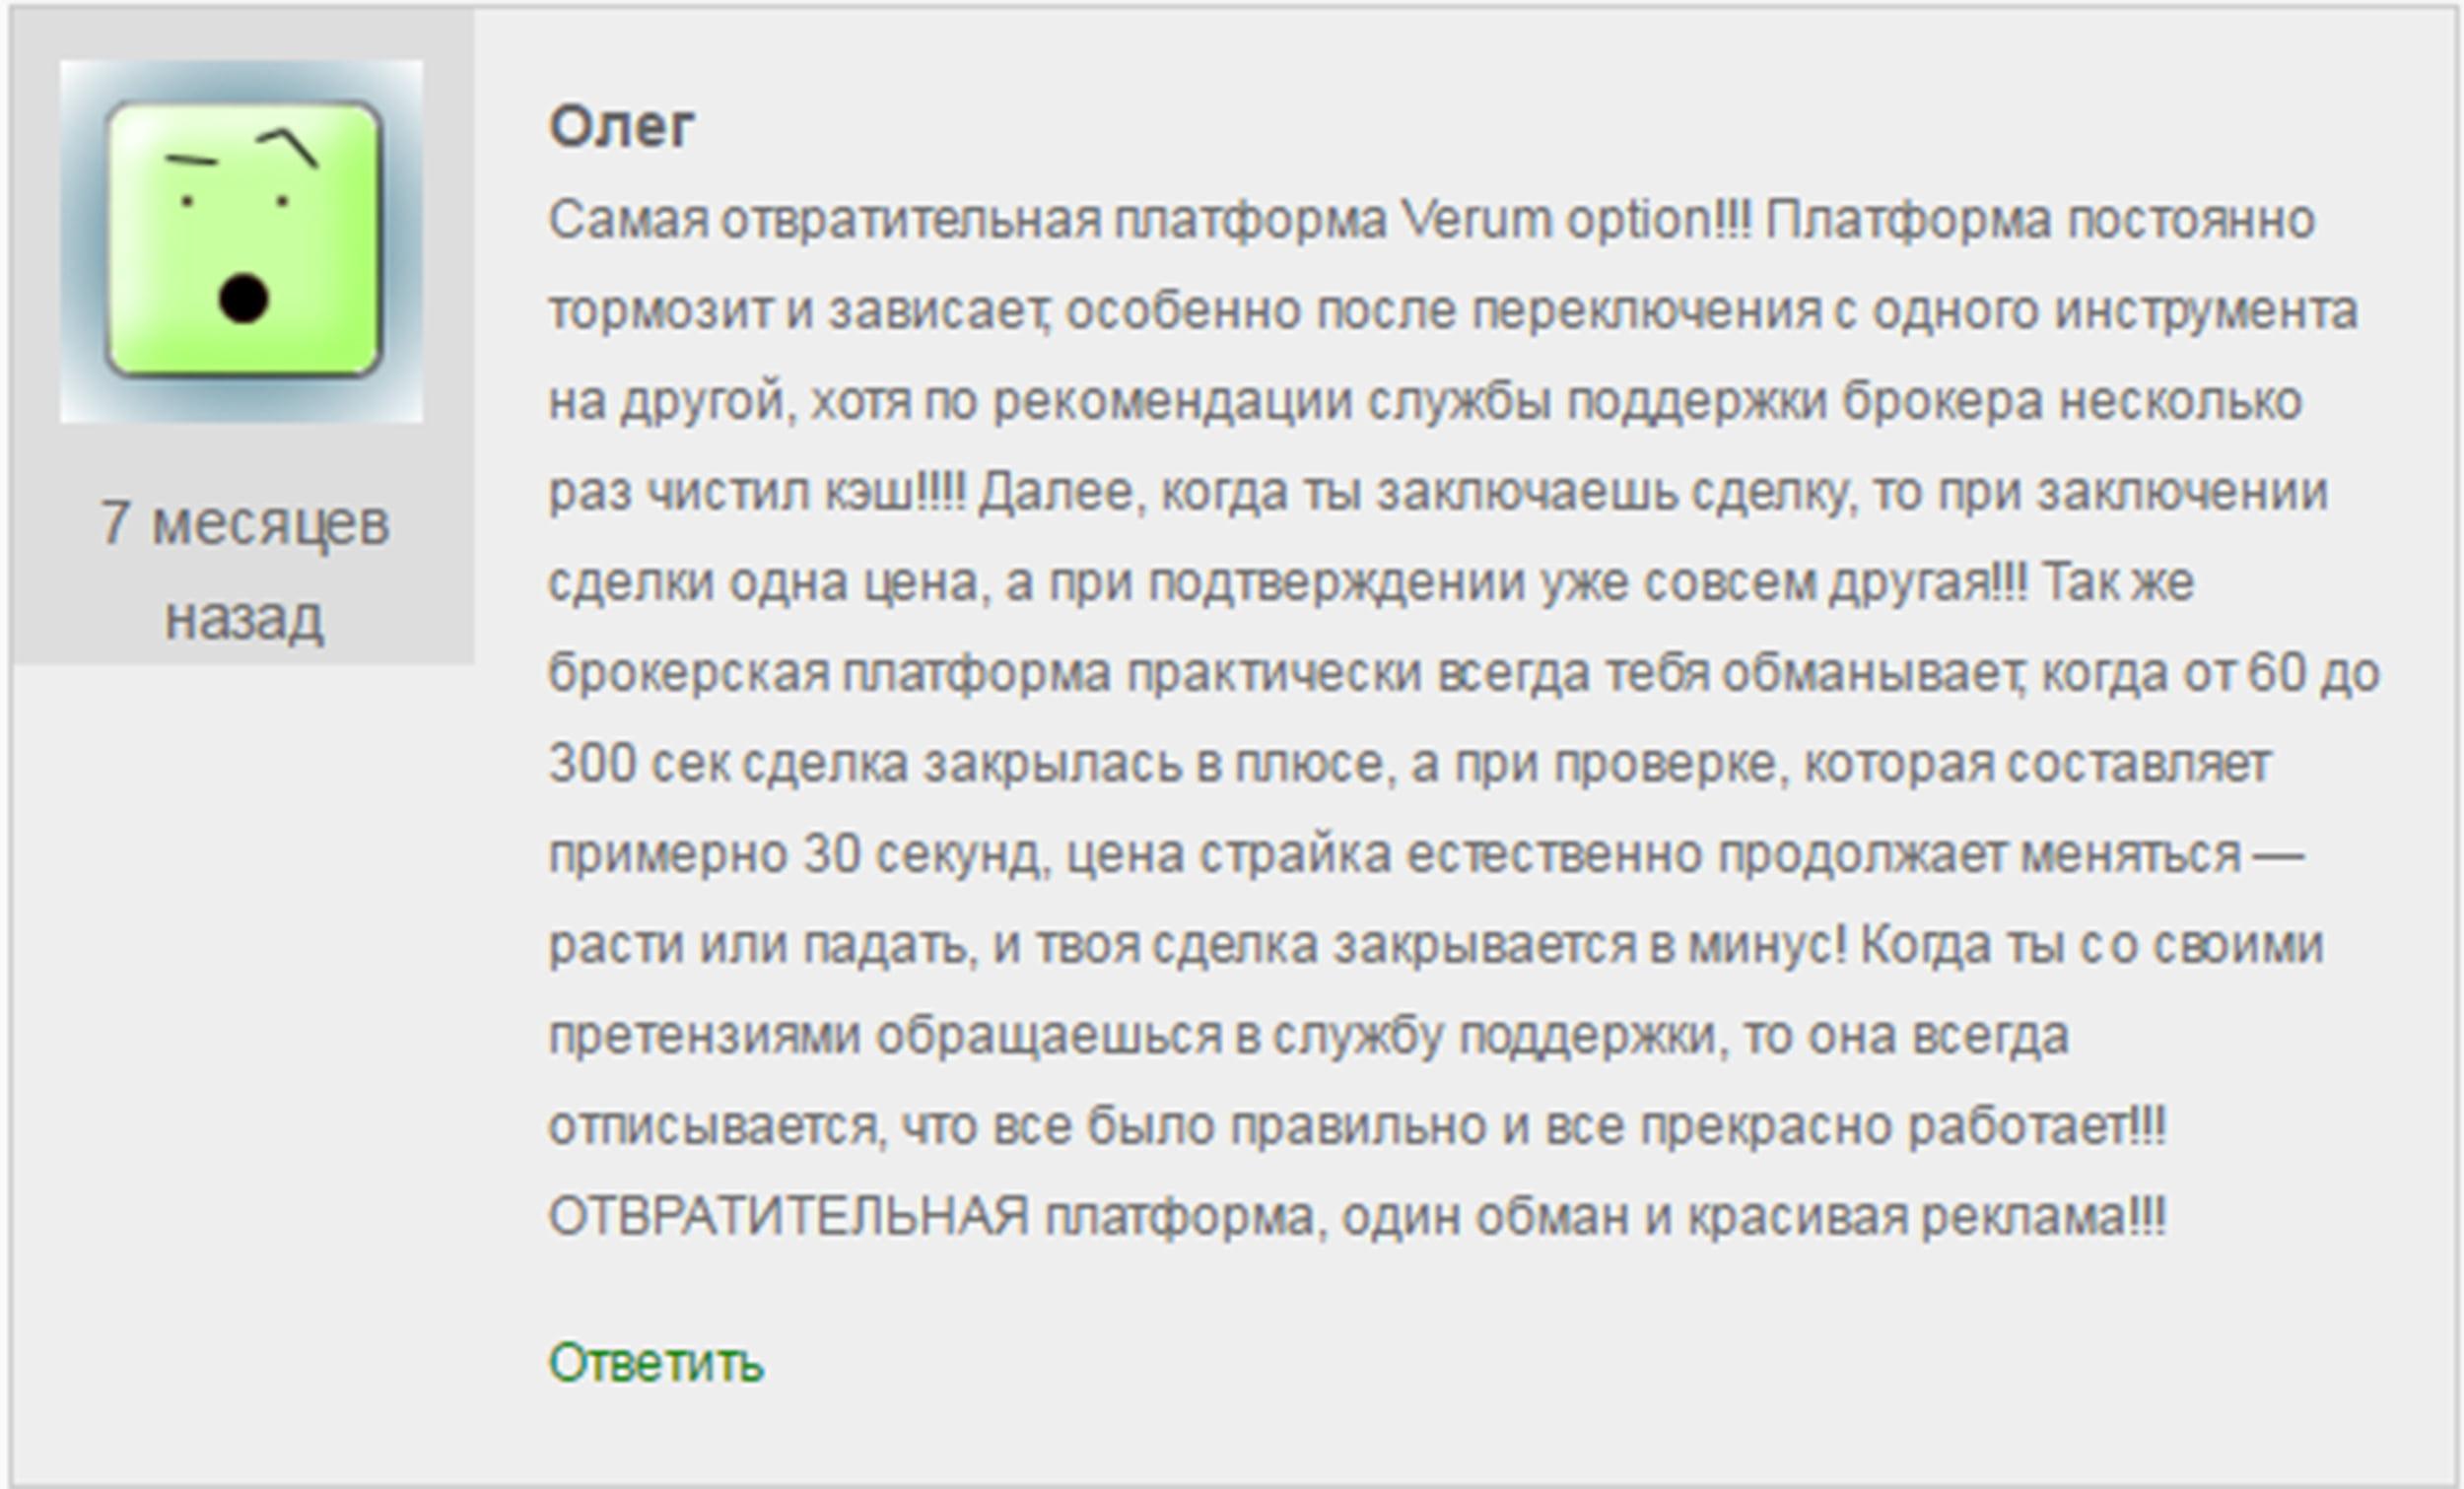 Верум оптион отзывы с форума netbinary.ru